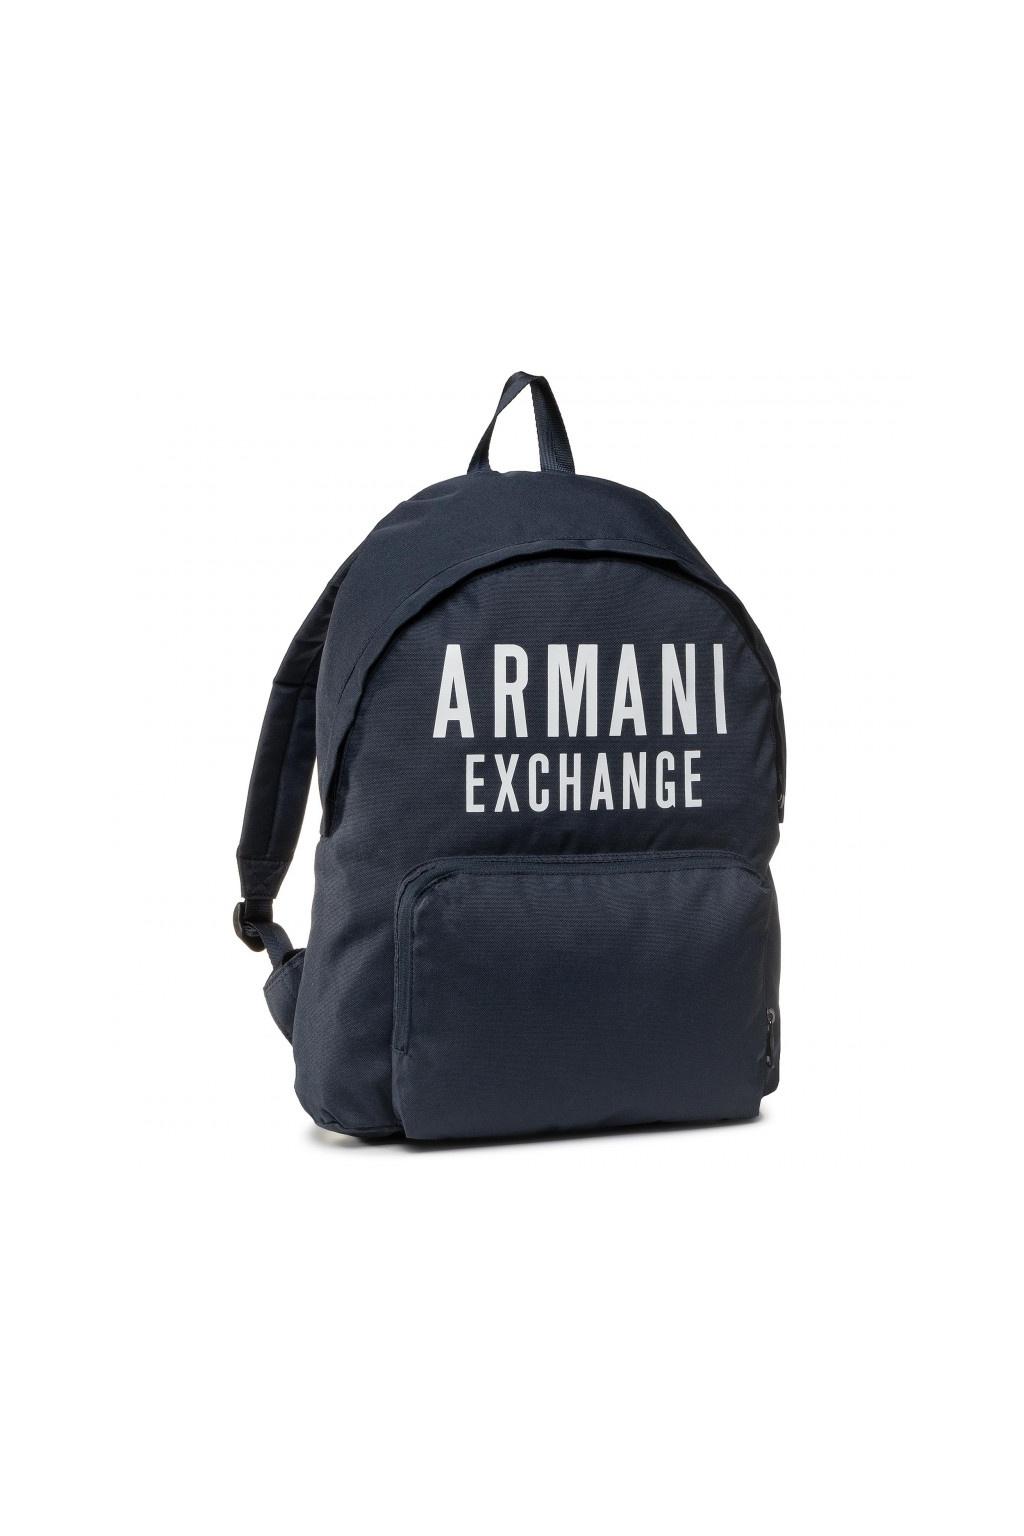 952199 9A124Pánský batoh Armani Exchange modrý